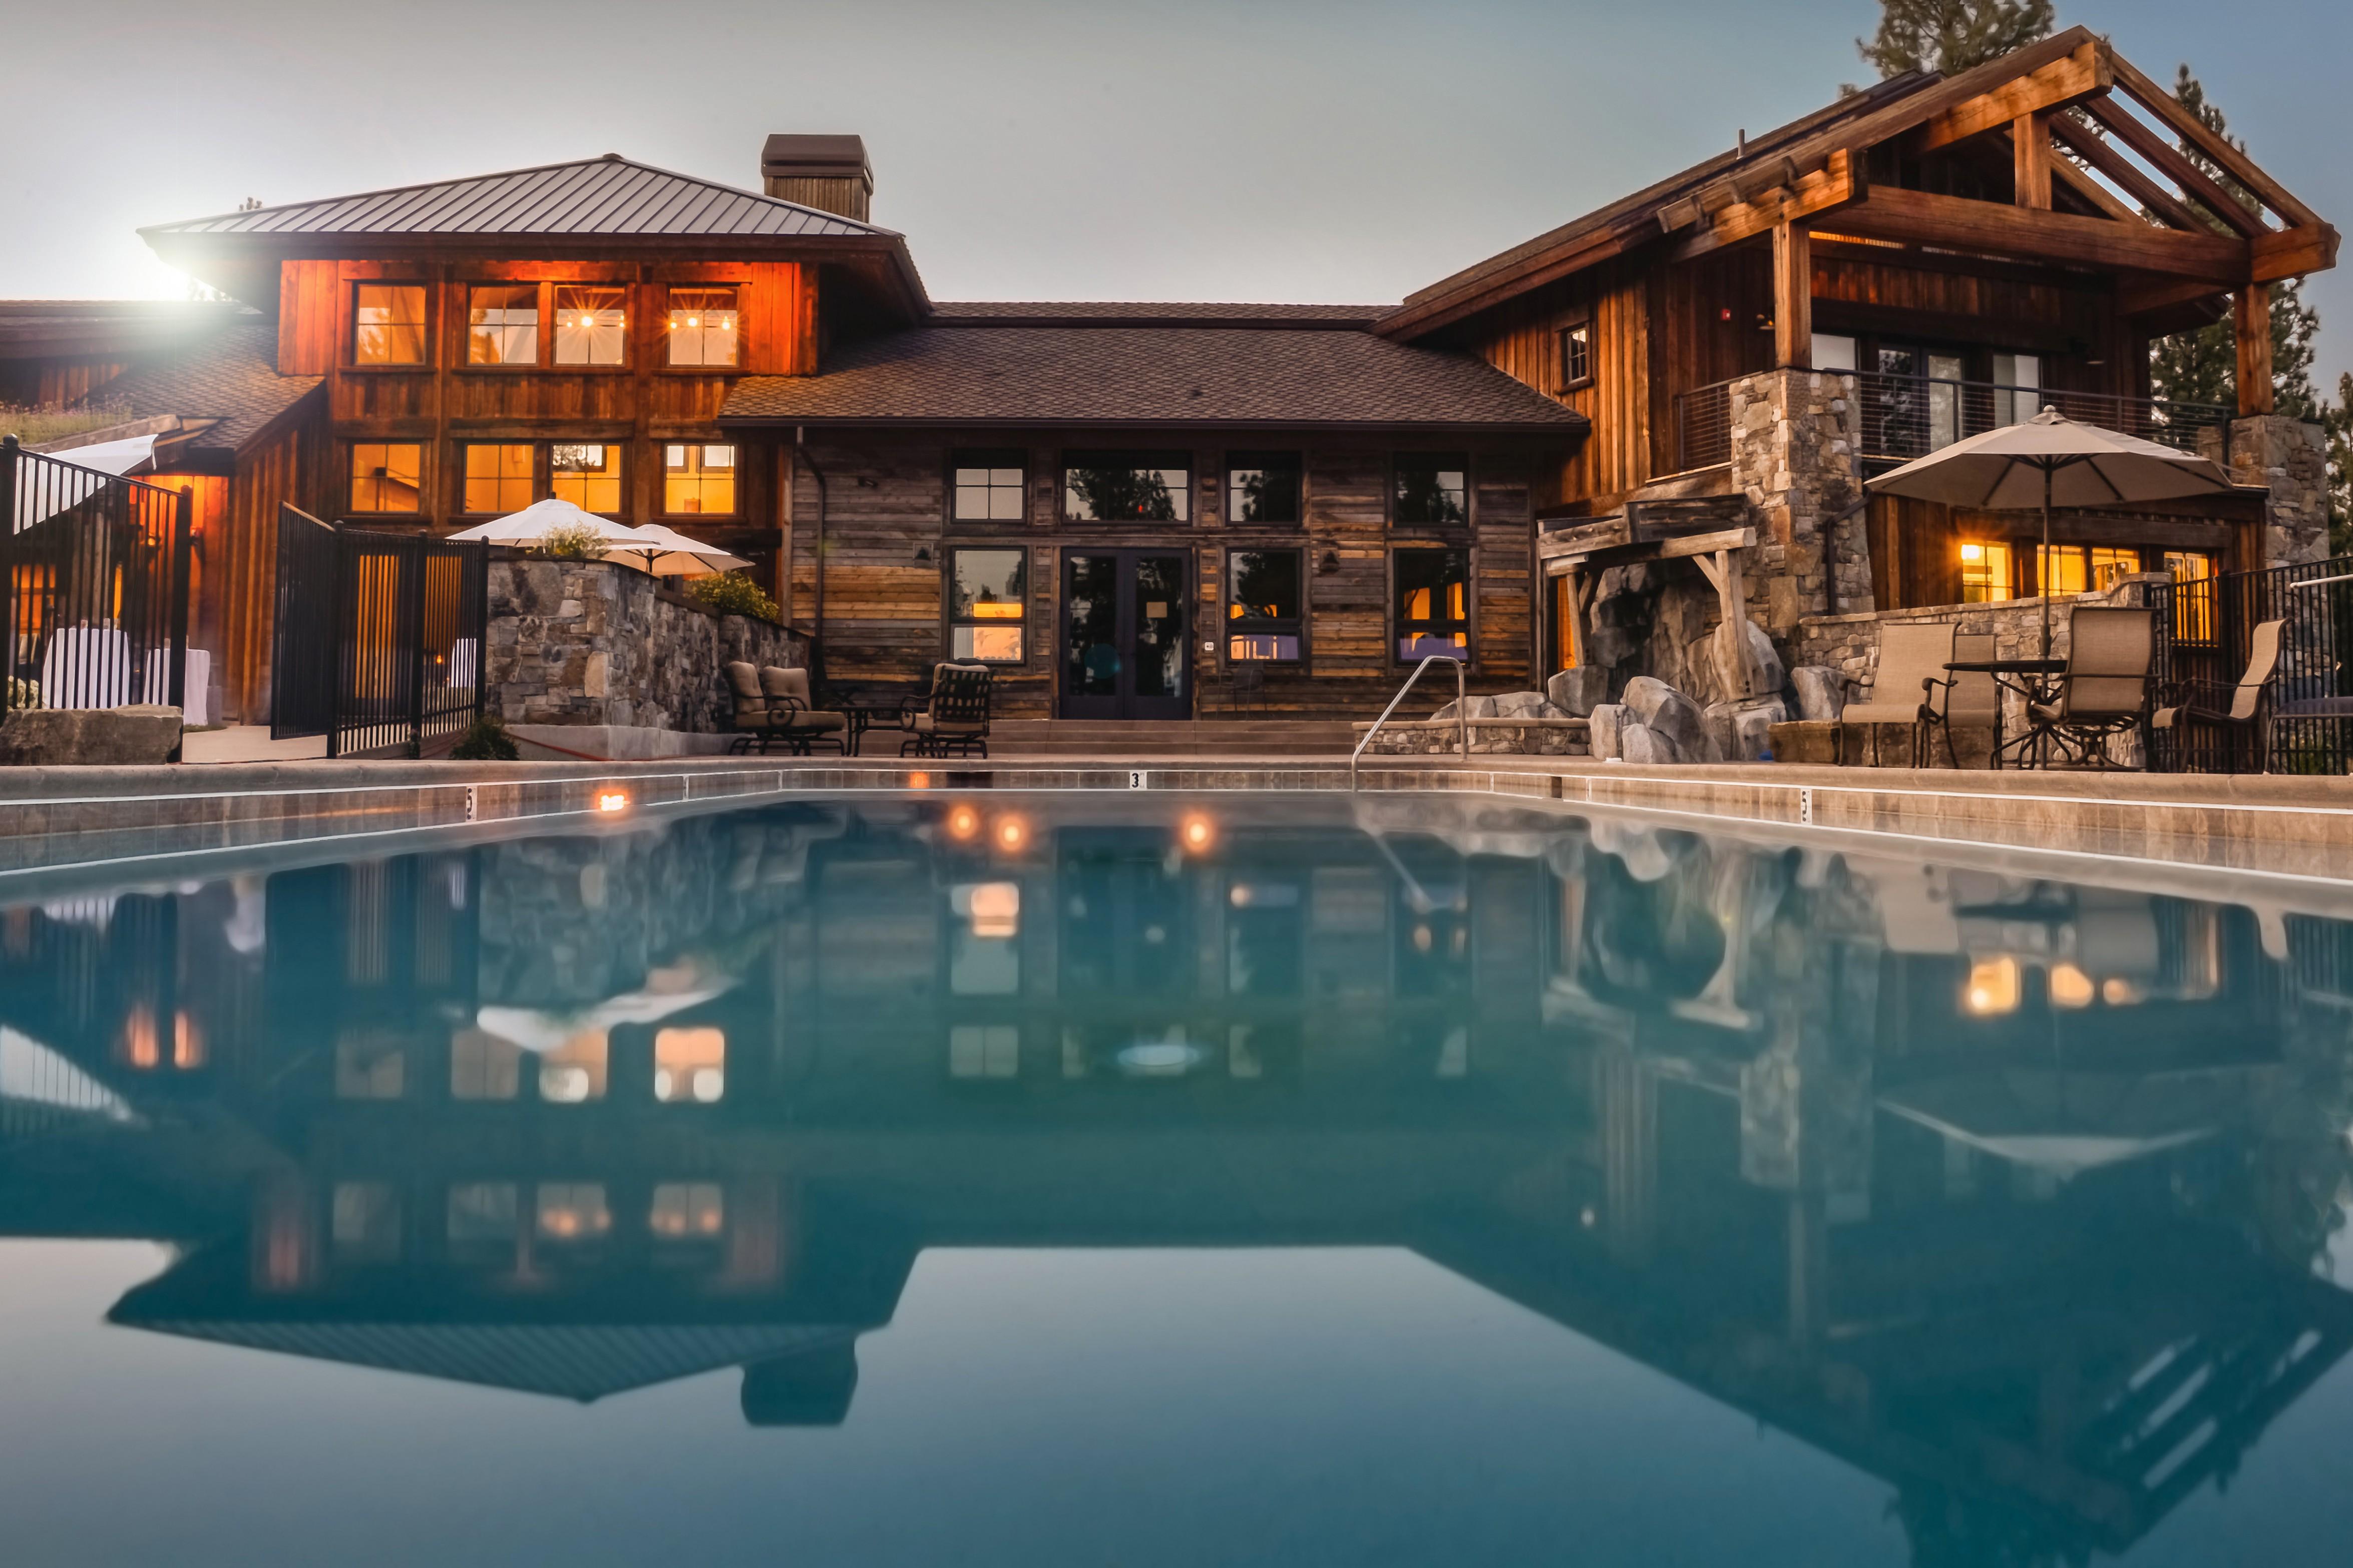 pexels-photo big house